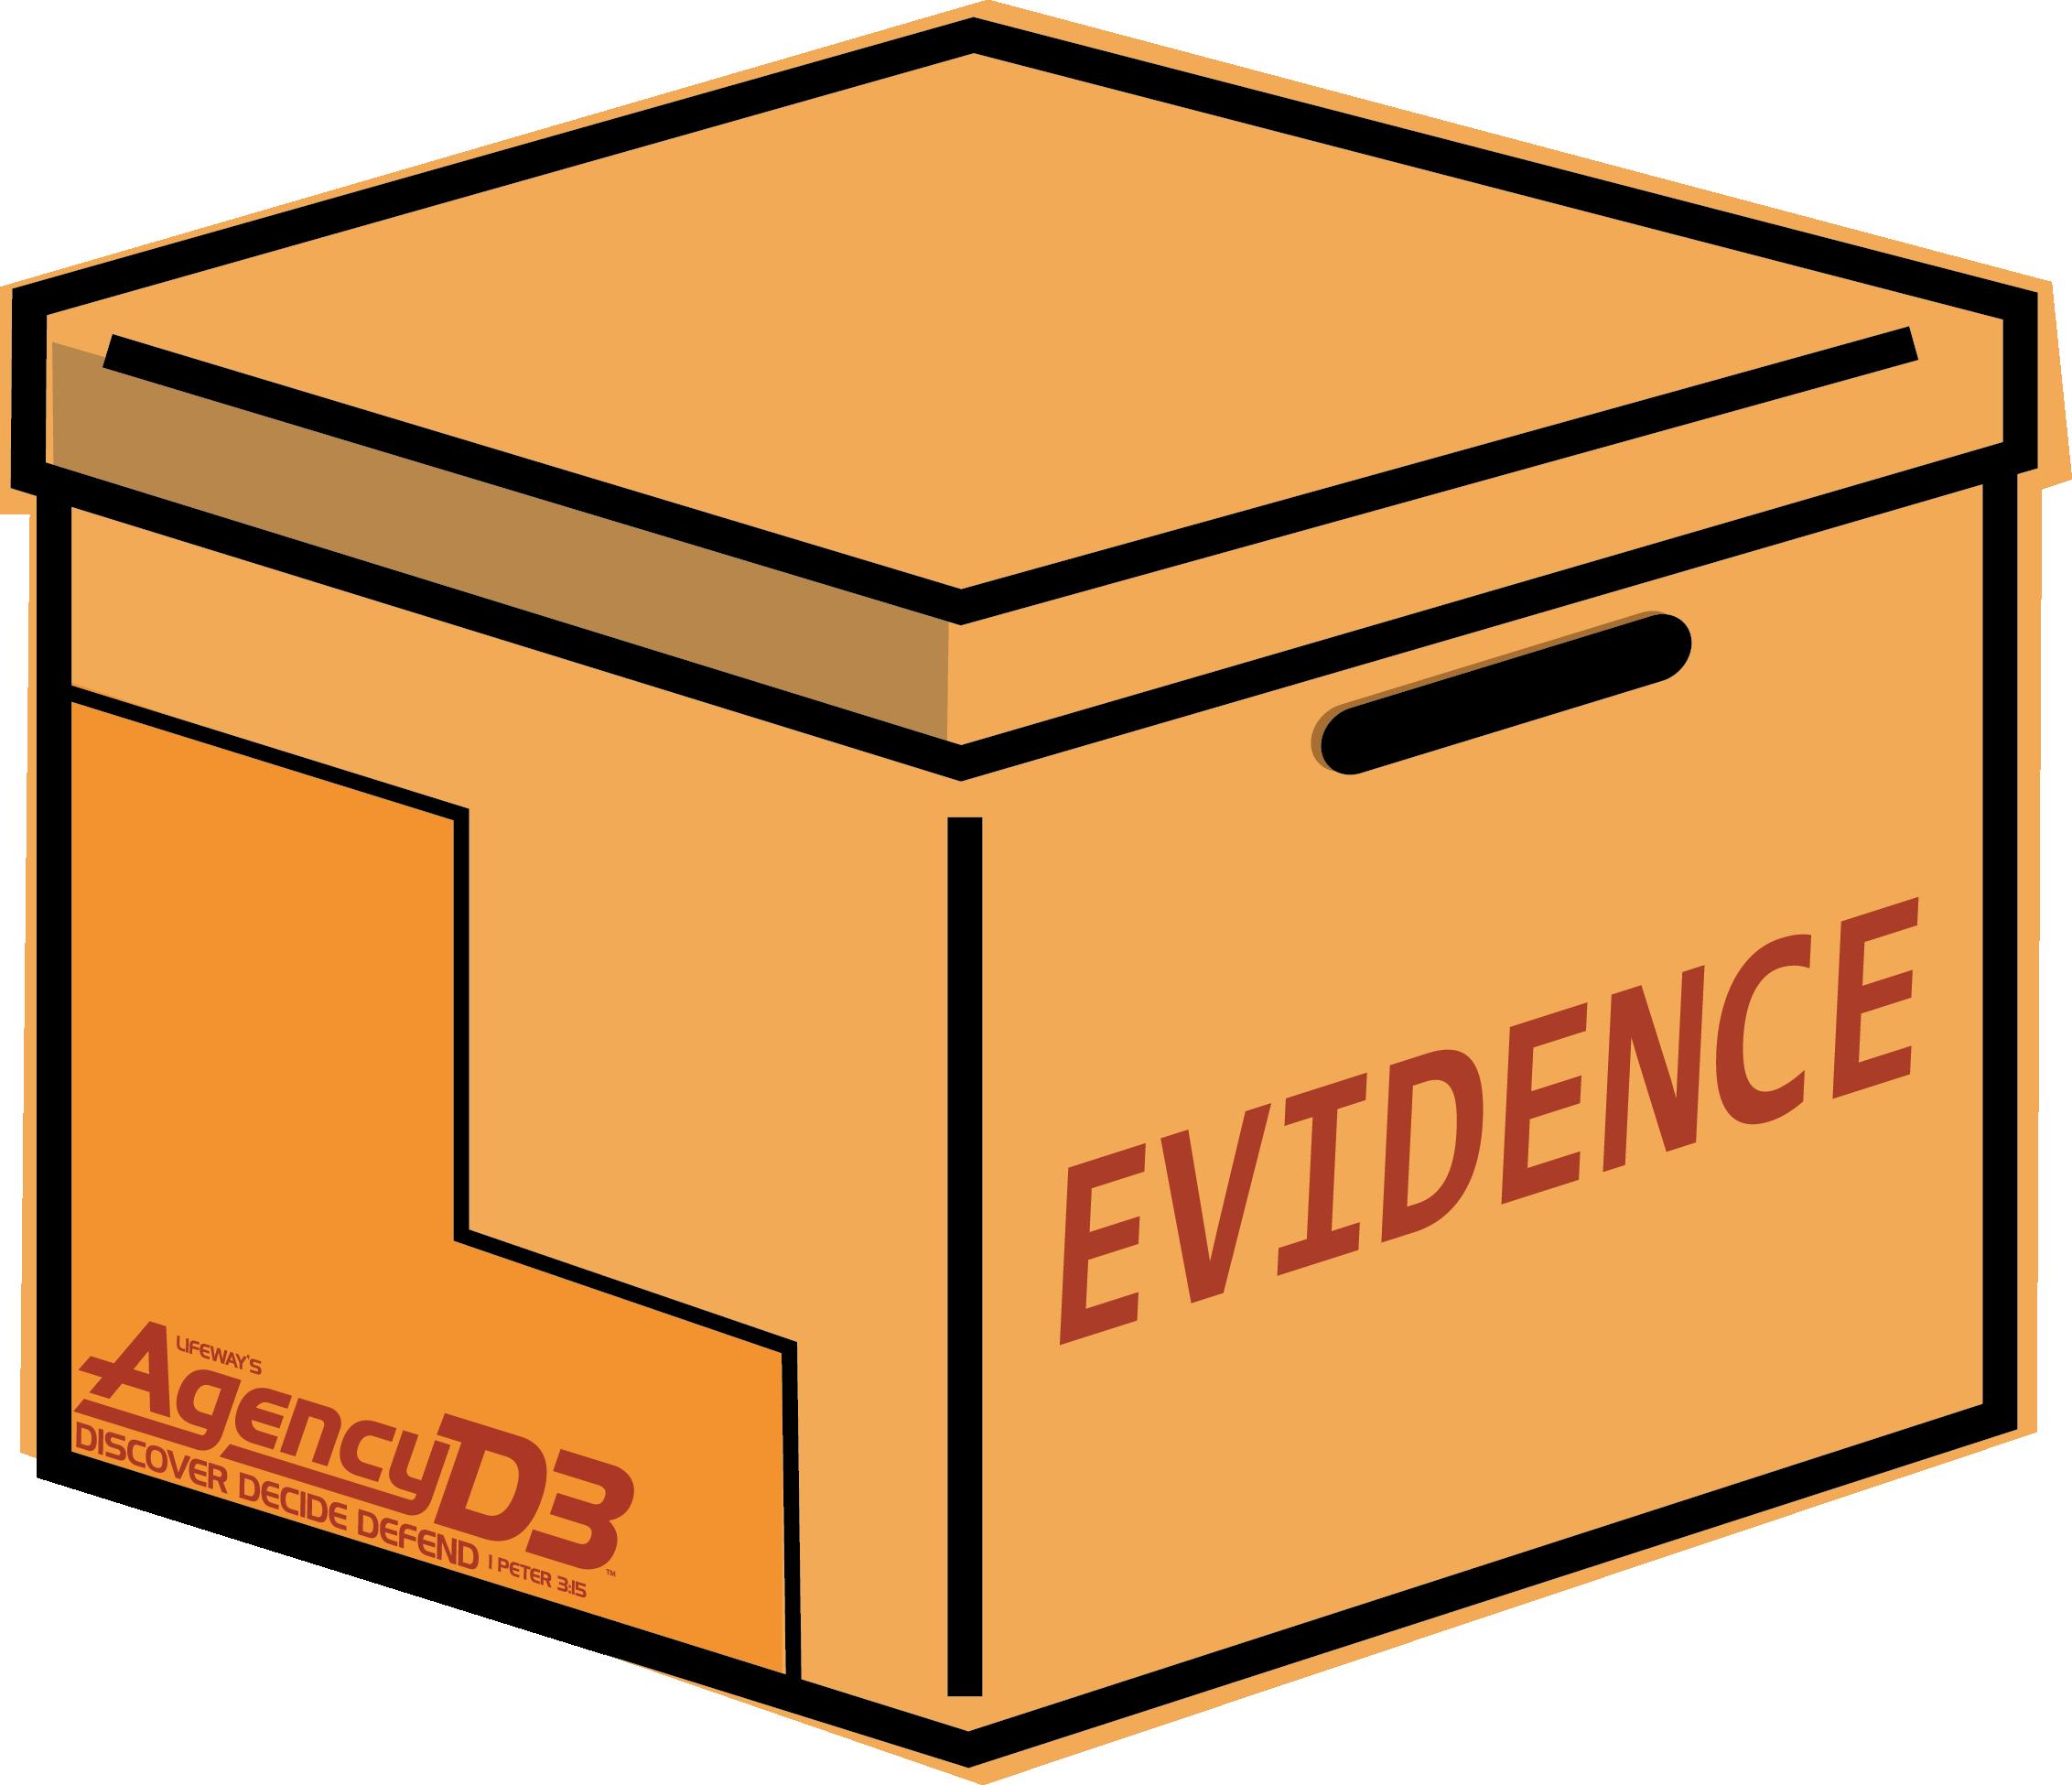 Secret clipart folder. Bag detective evidence clip